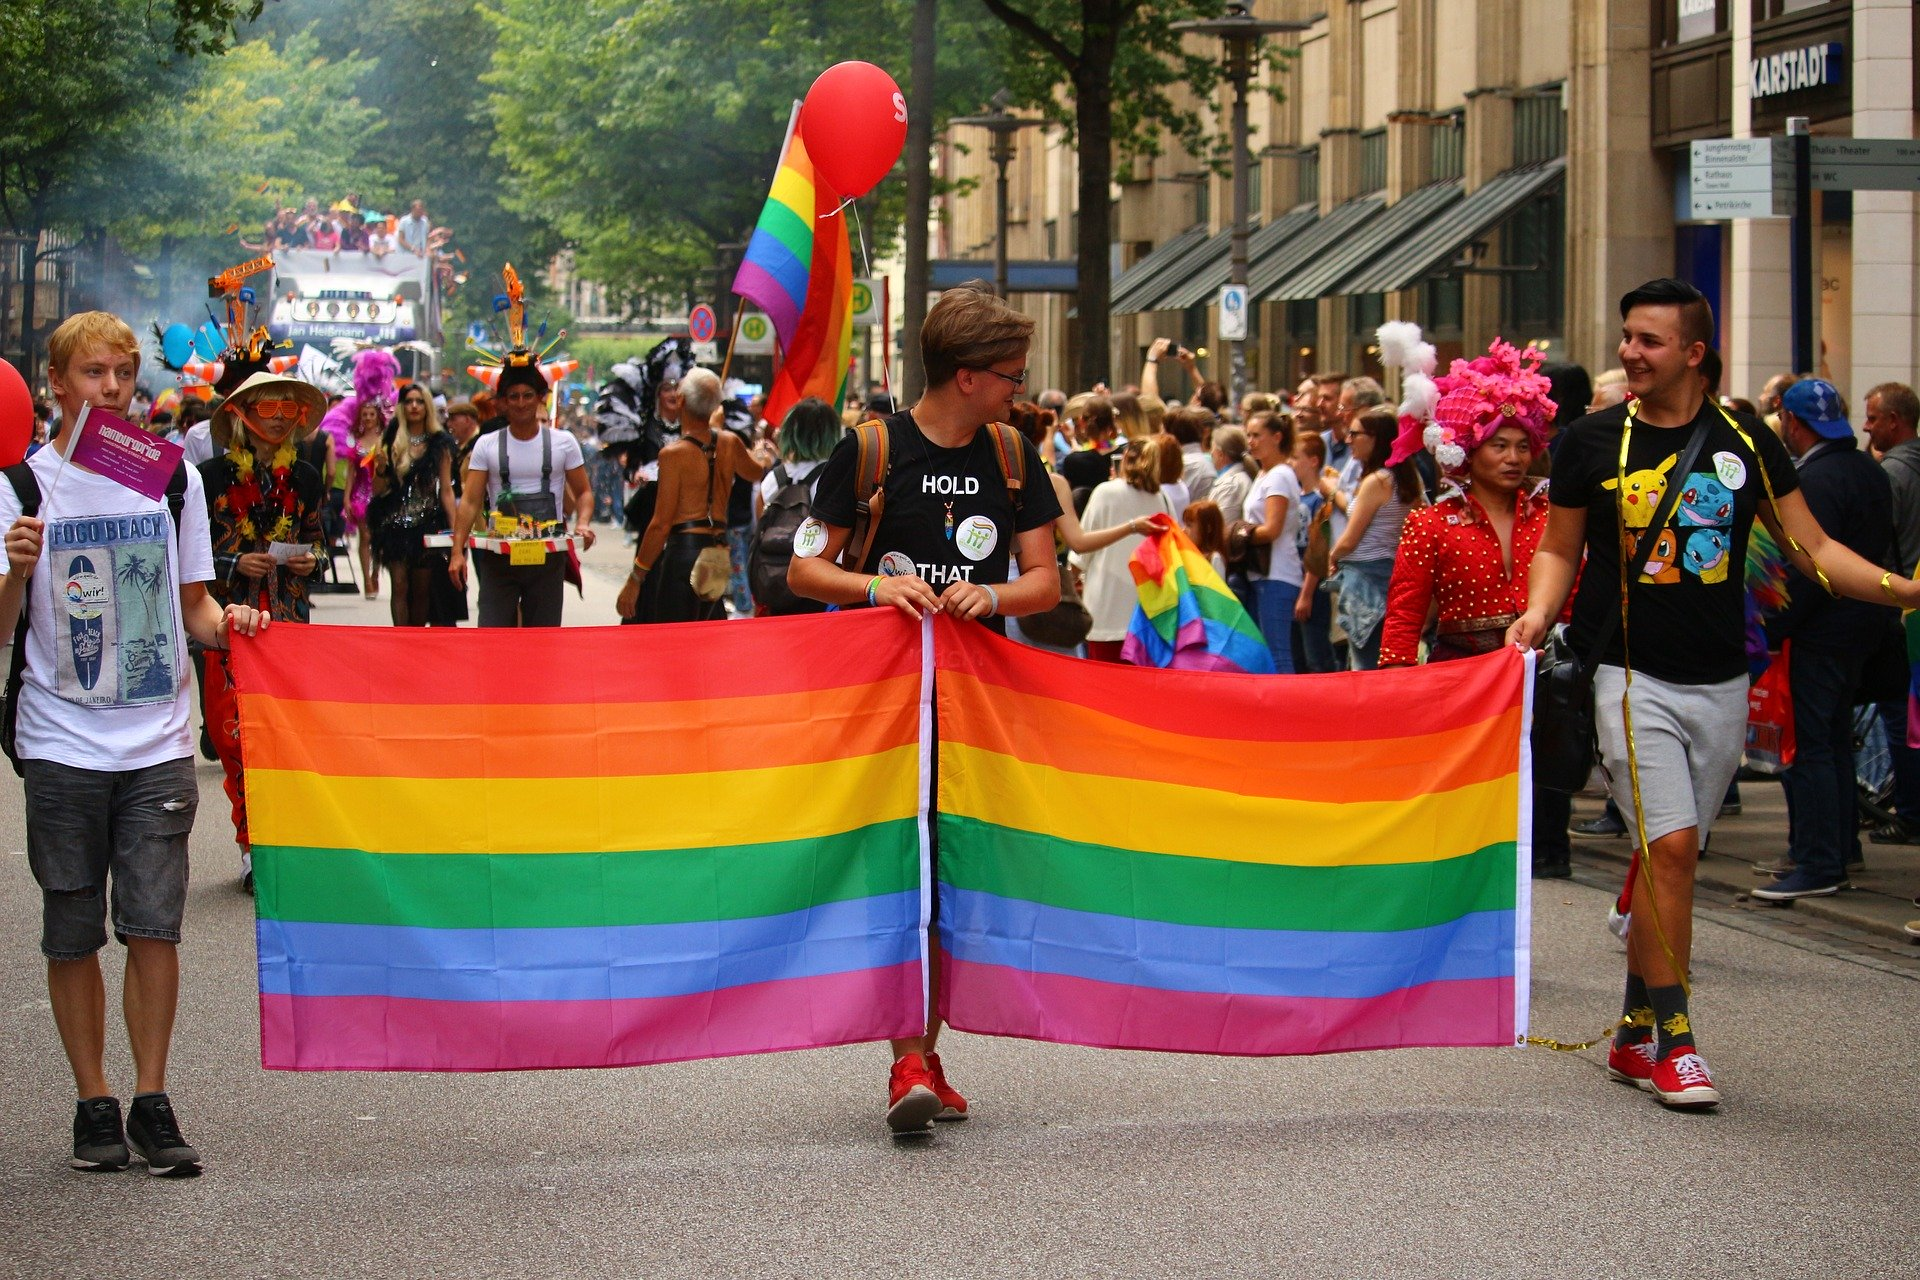 Pride während Corona: So feiert Hamburg den CSD   FINK.HAMBURG